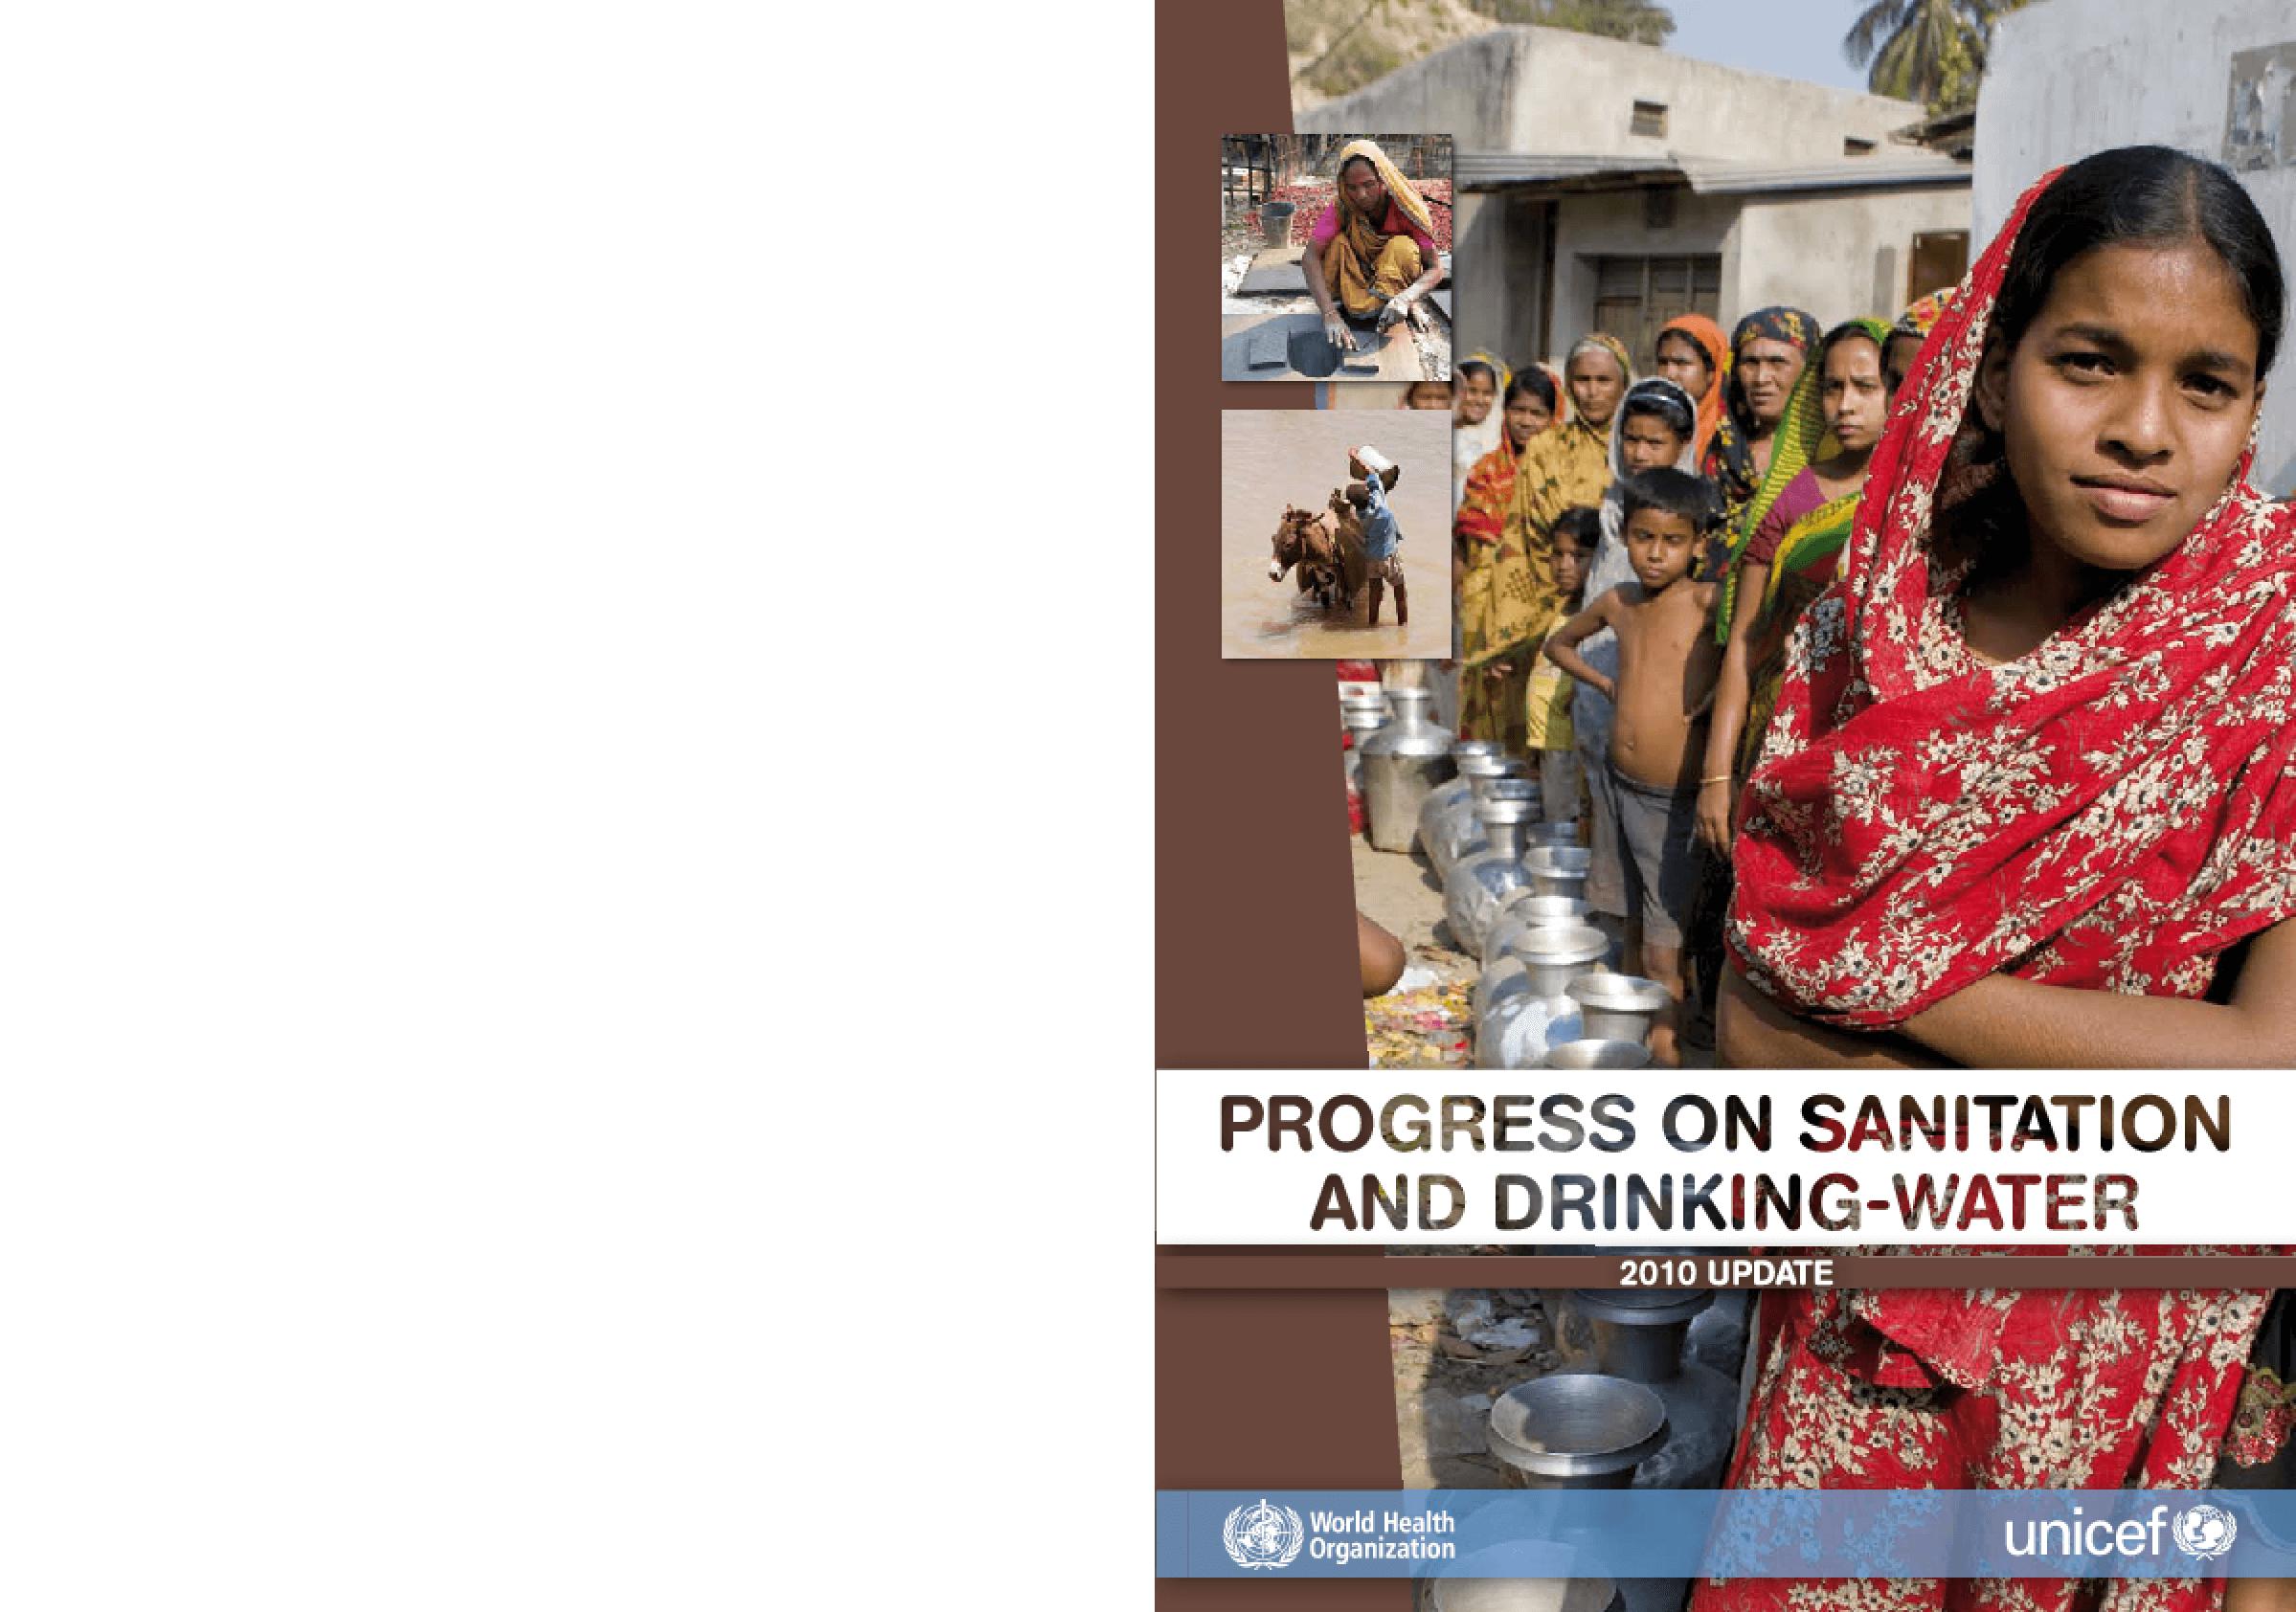 Progress on Sanitation and Drinking-Water 2010 Update